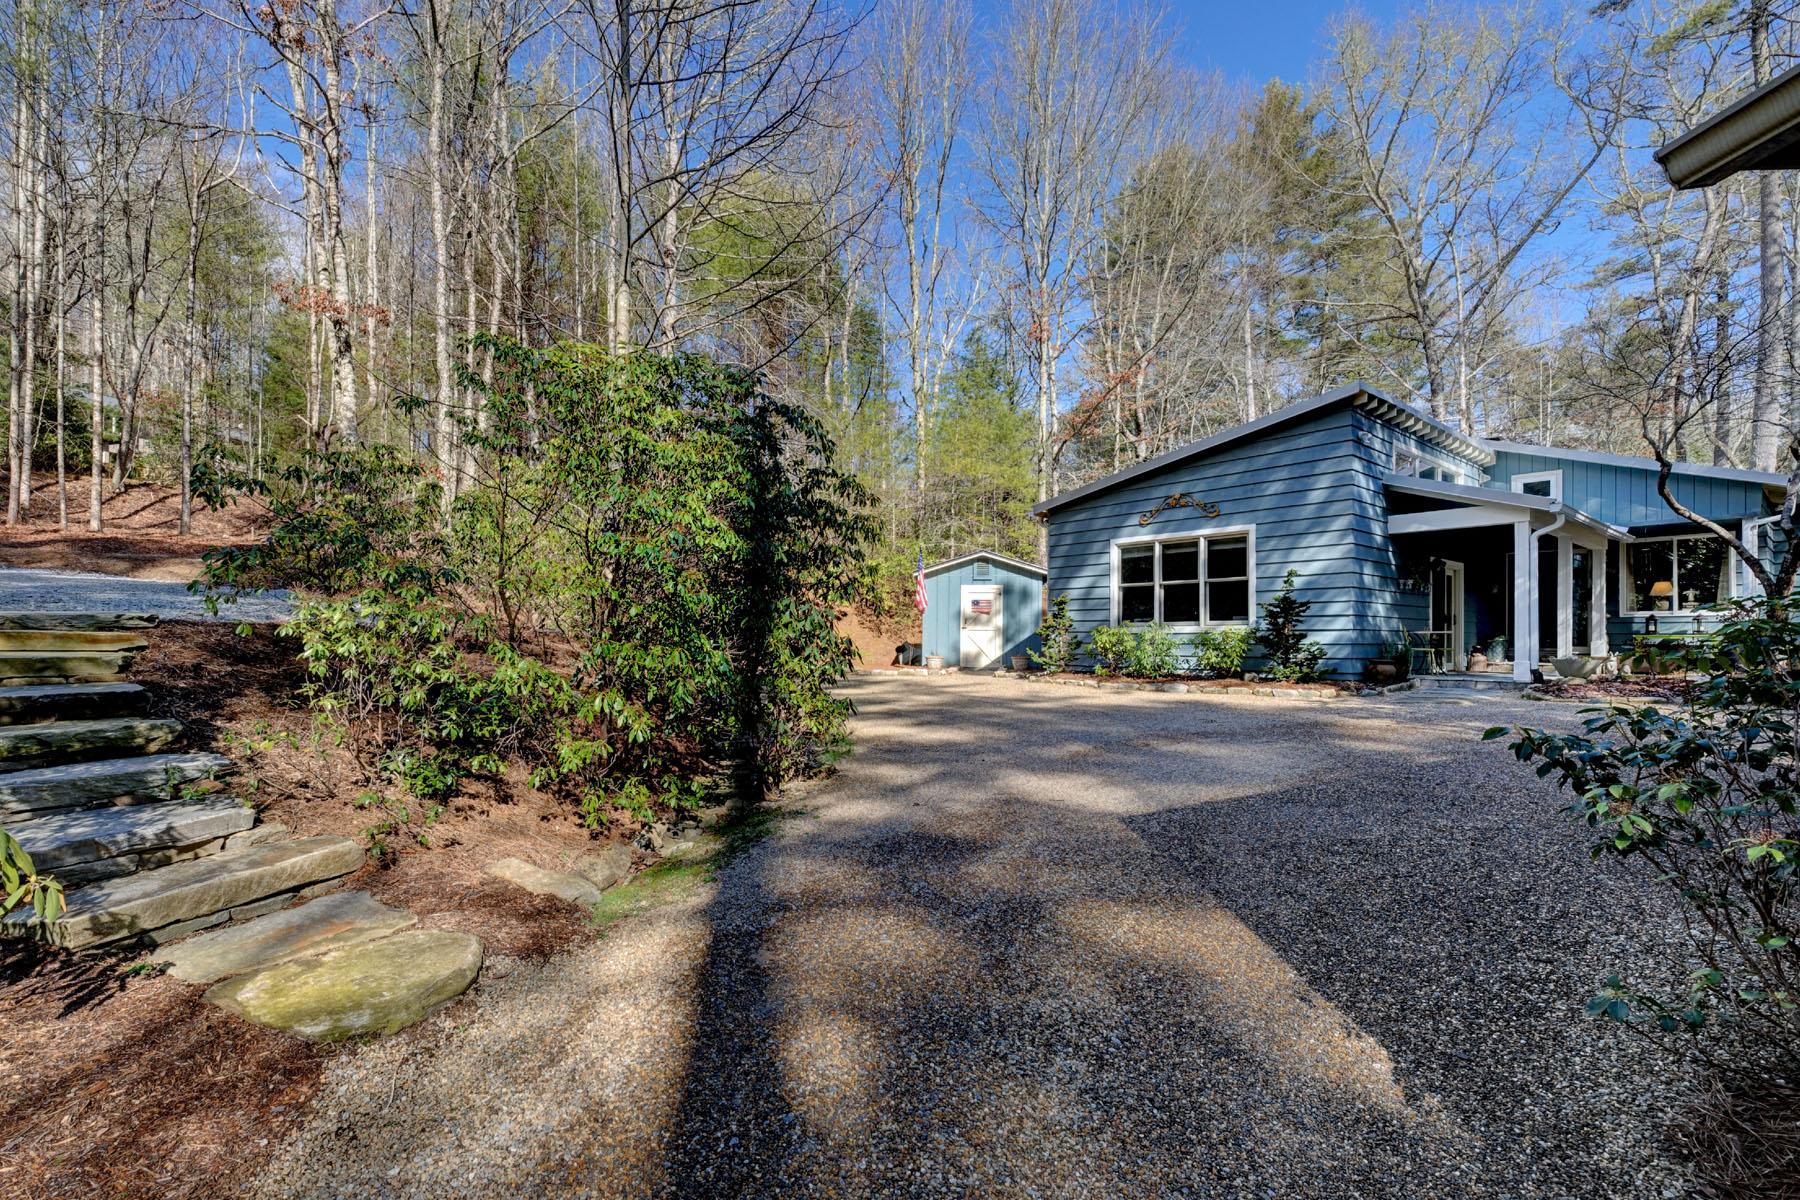 Single Family Home for Sale at McIntyre 55 Potter Lane Highlands, North Carolina, 28741 United States